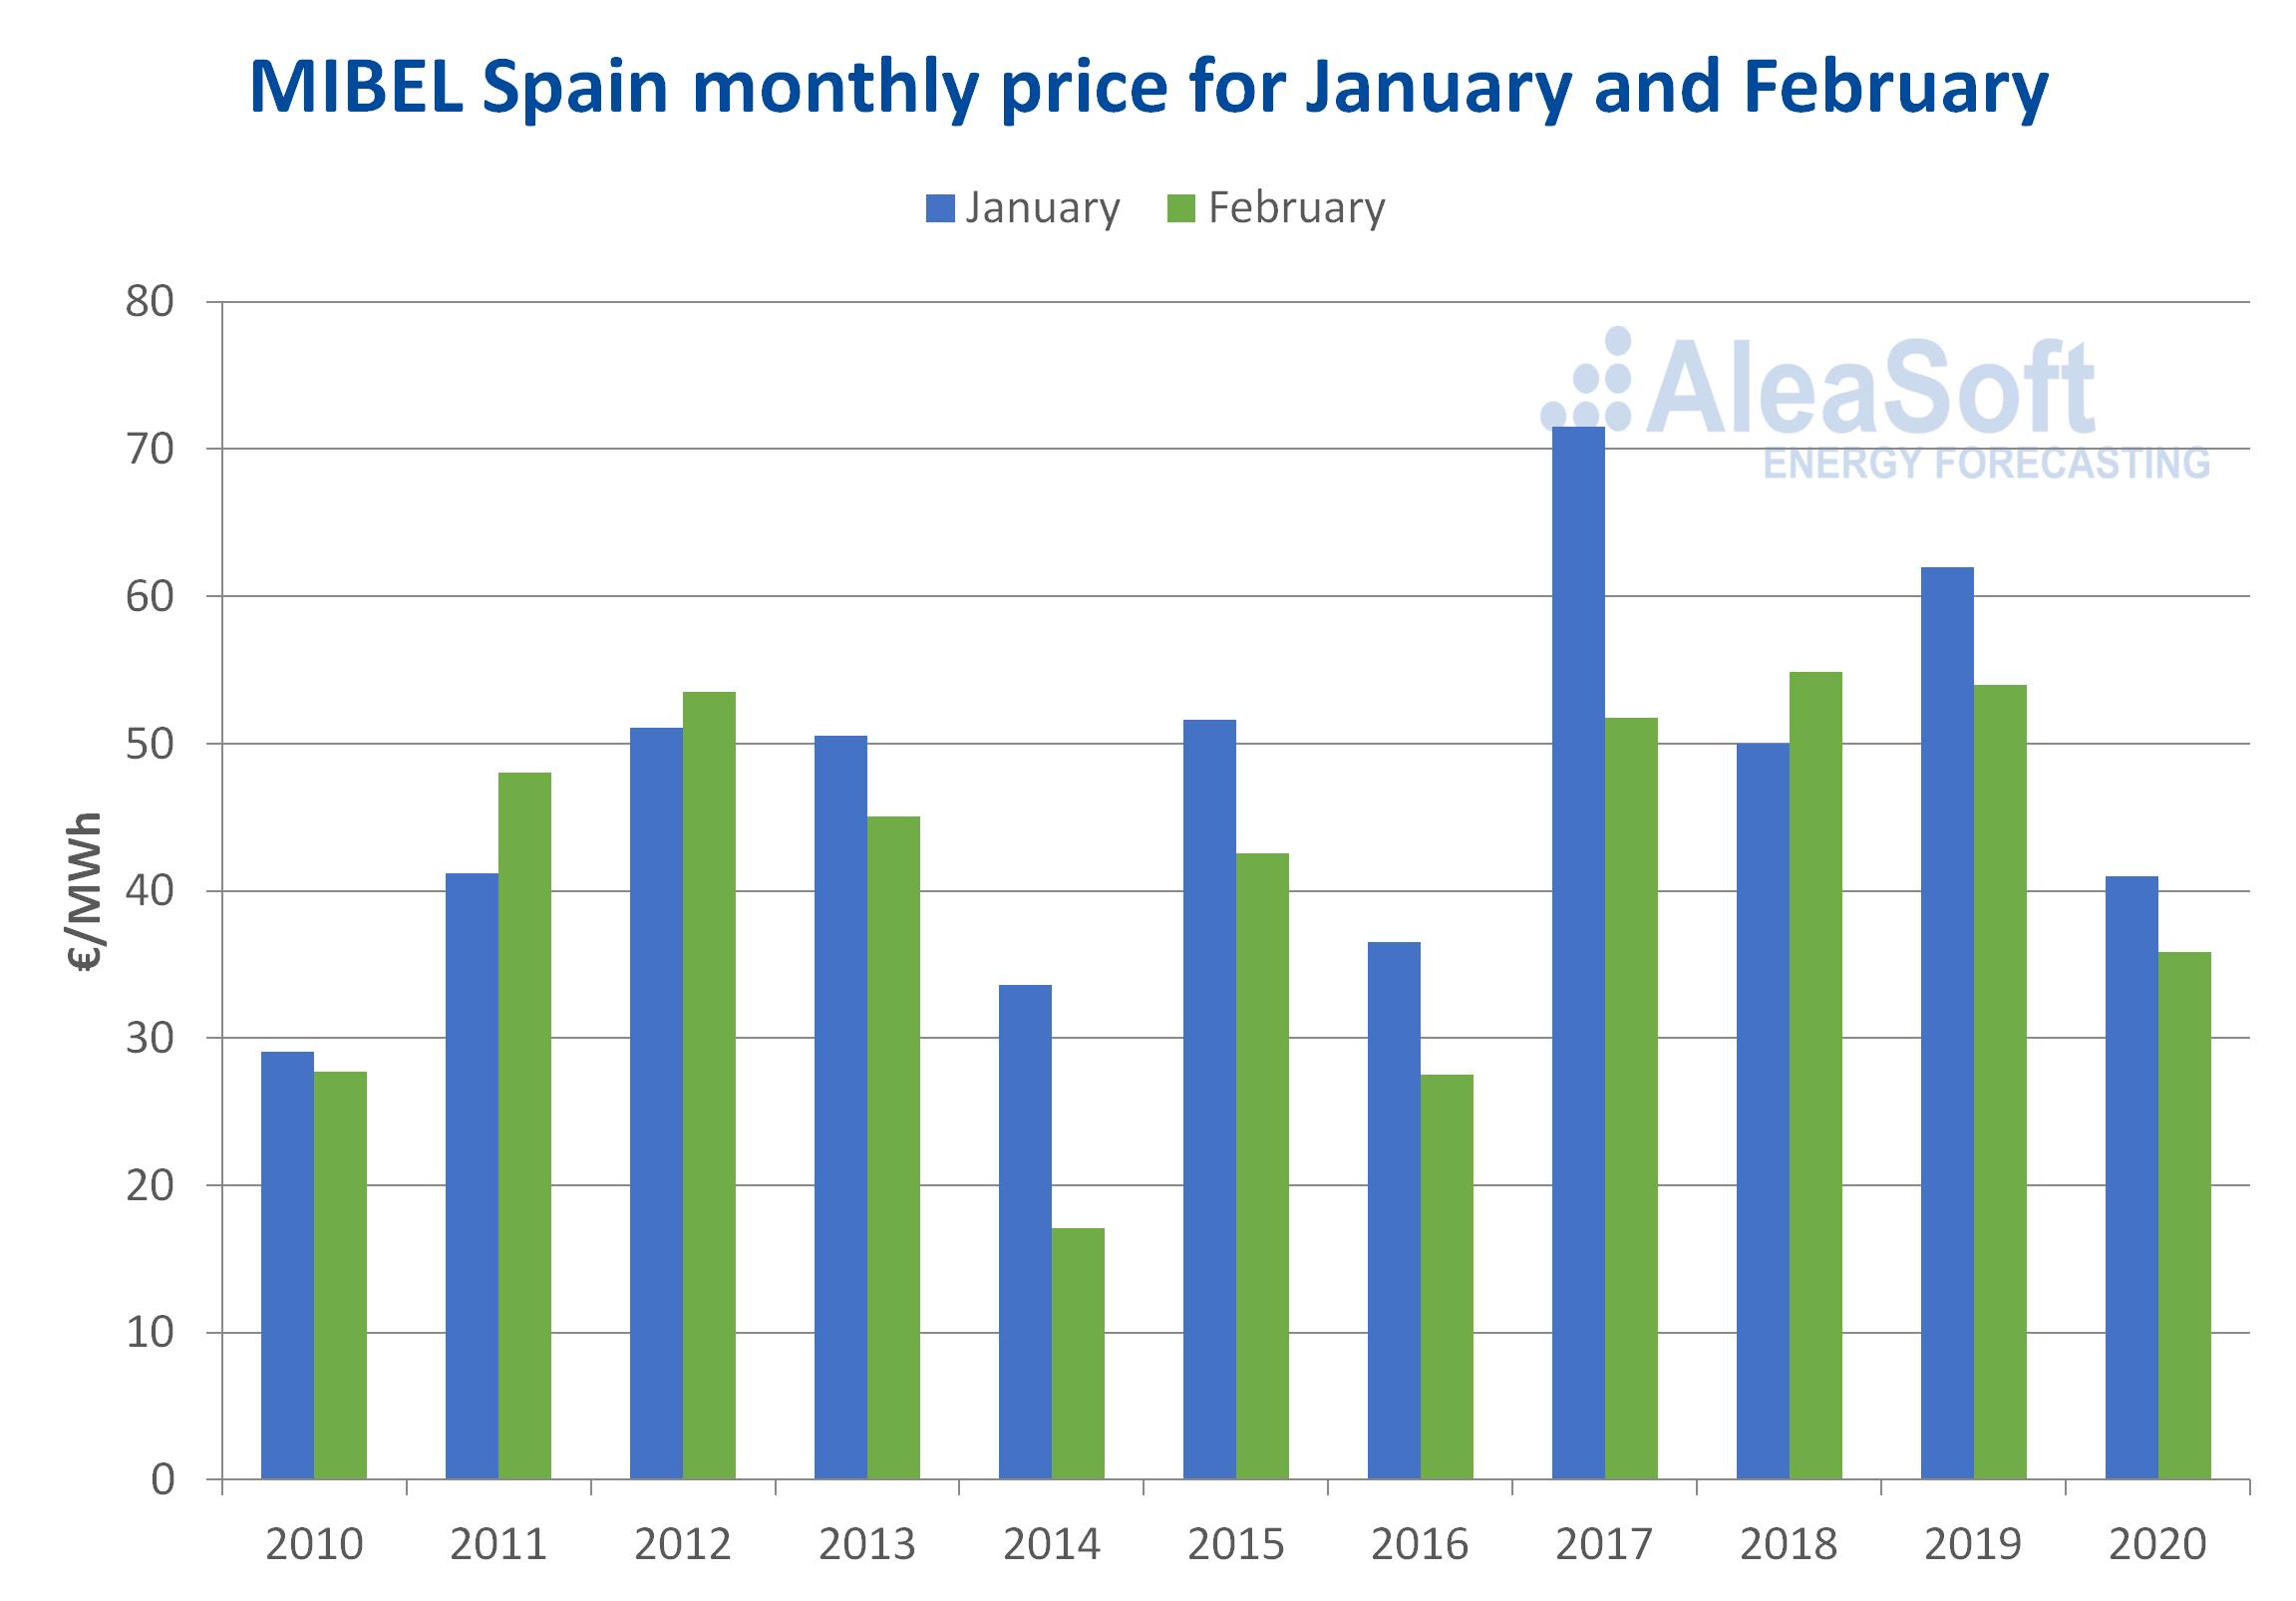 AleaSoft - Mibel spain monthly price january february